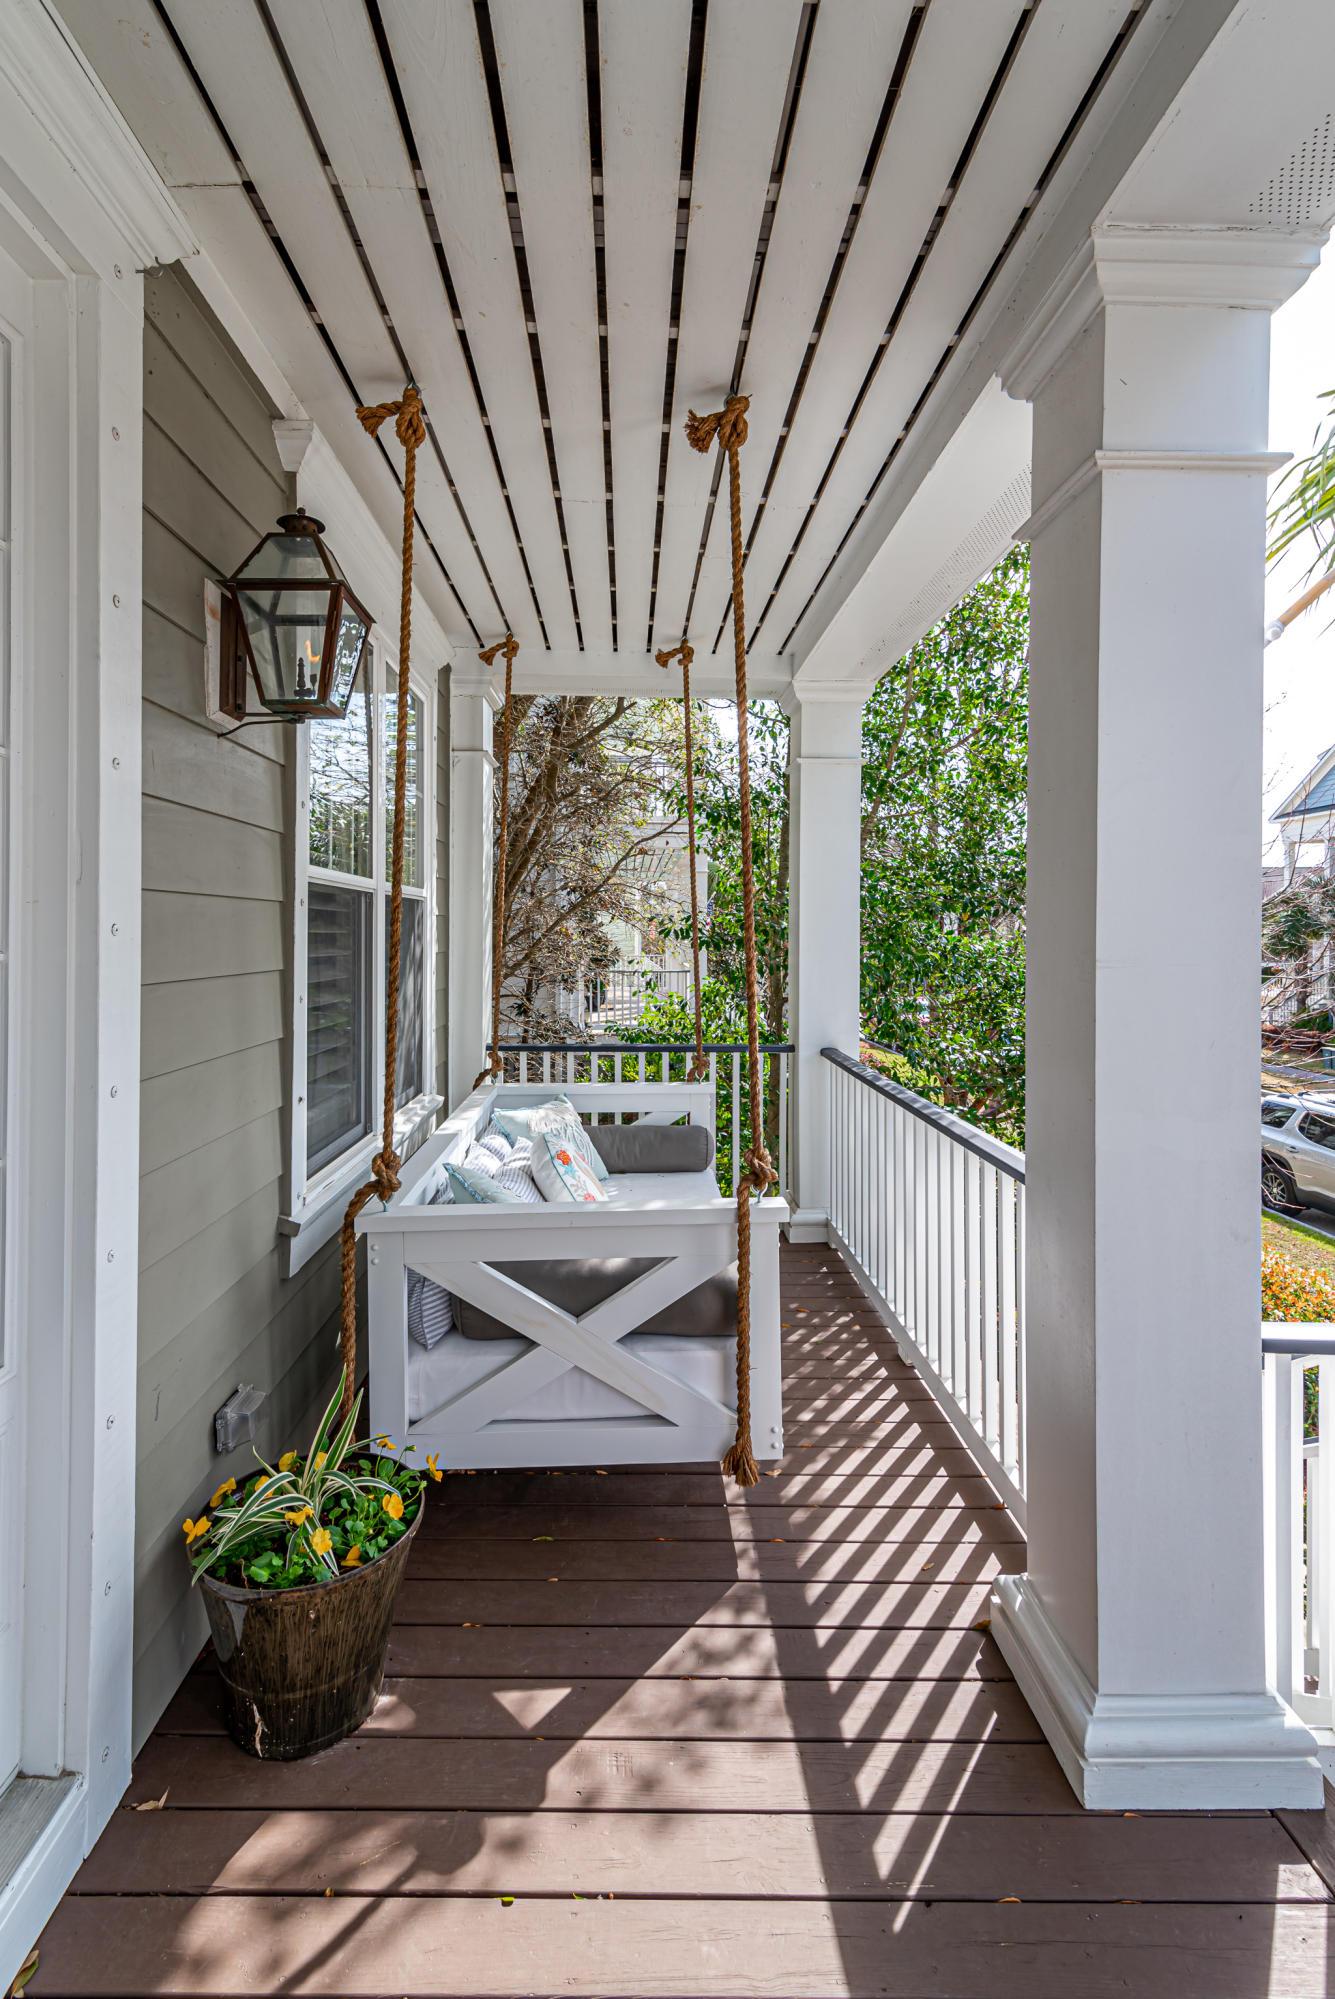 Daniel Island Smythe Park Homes For Sale - 1410 Wando View, Charleston, SC - 13